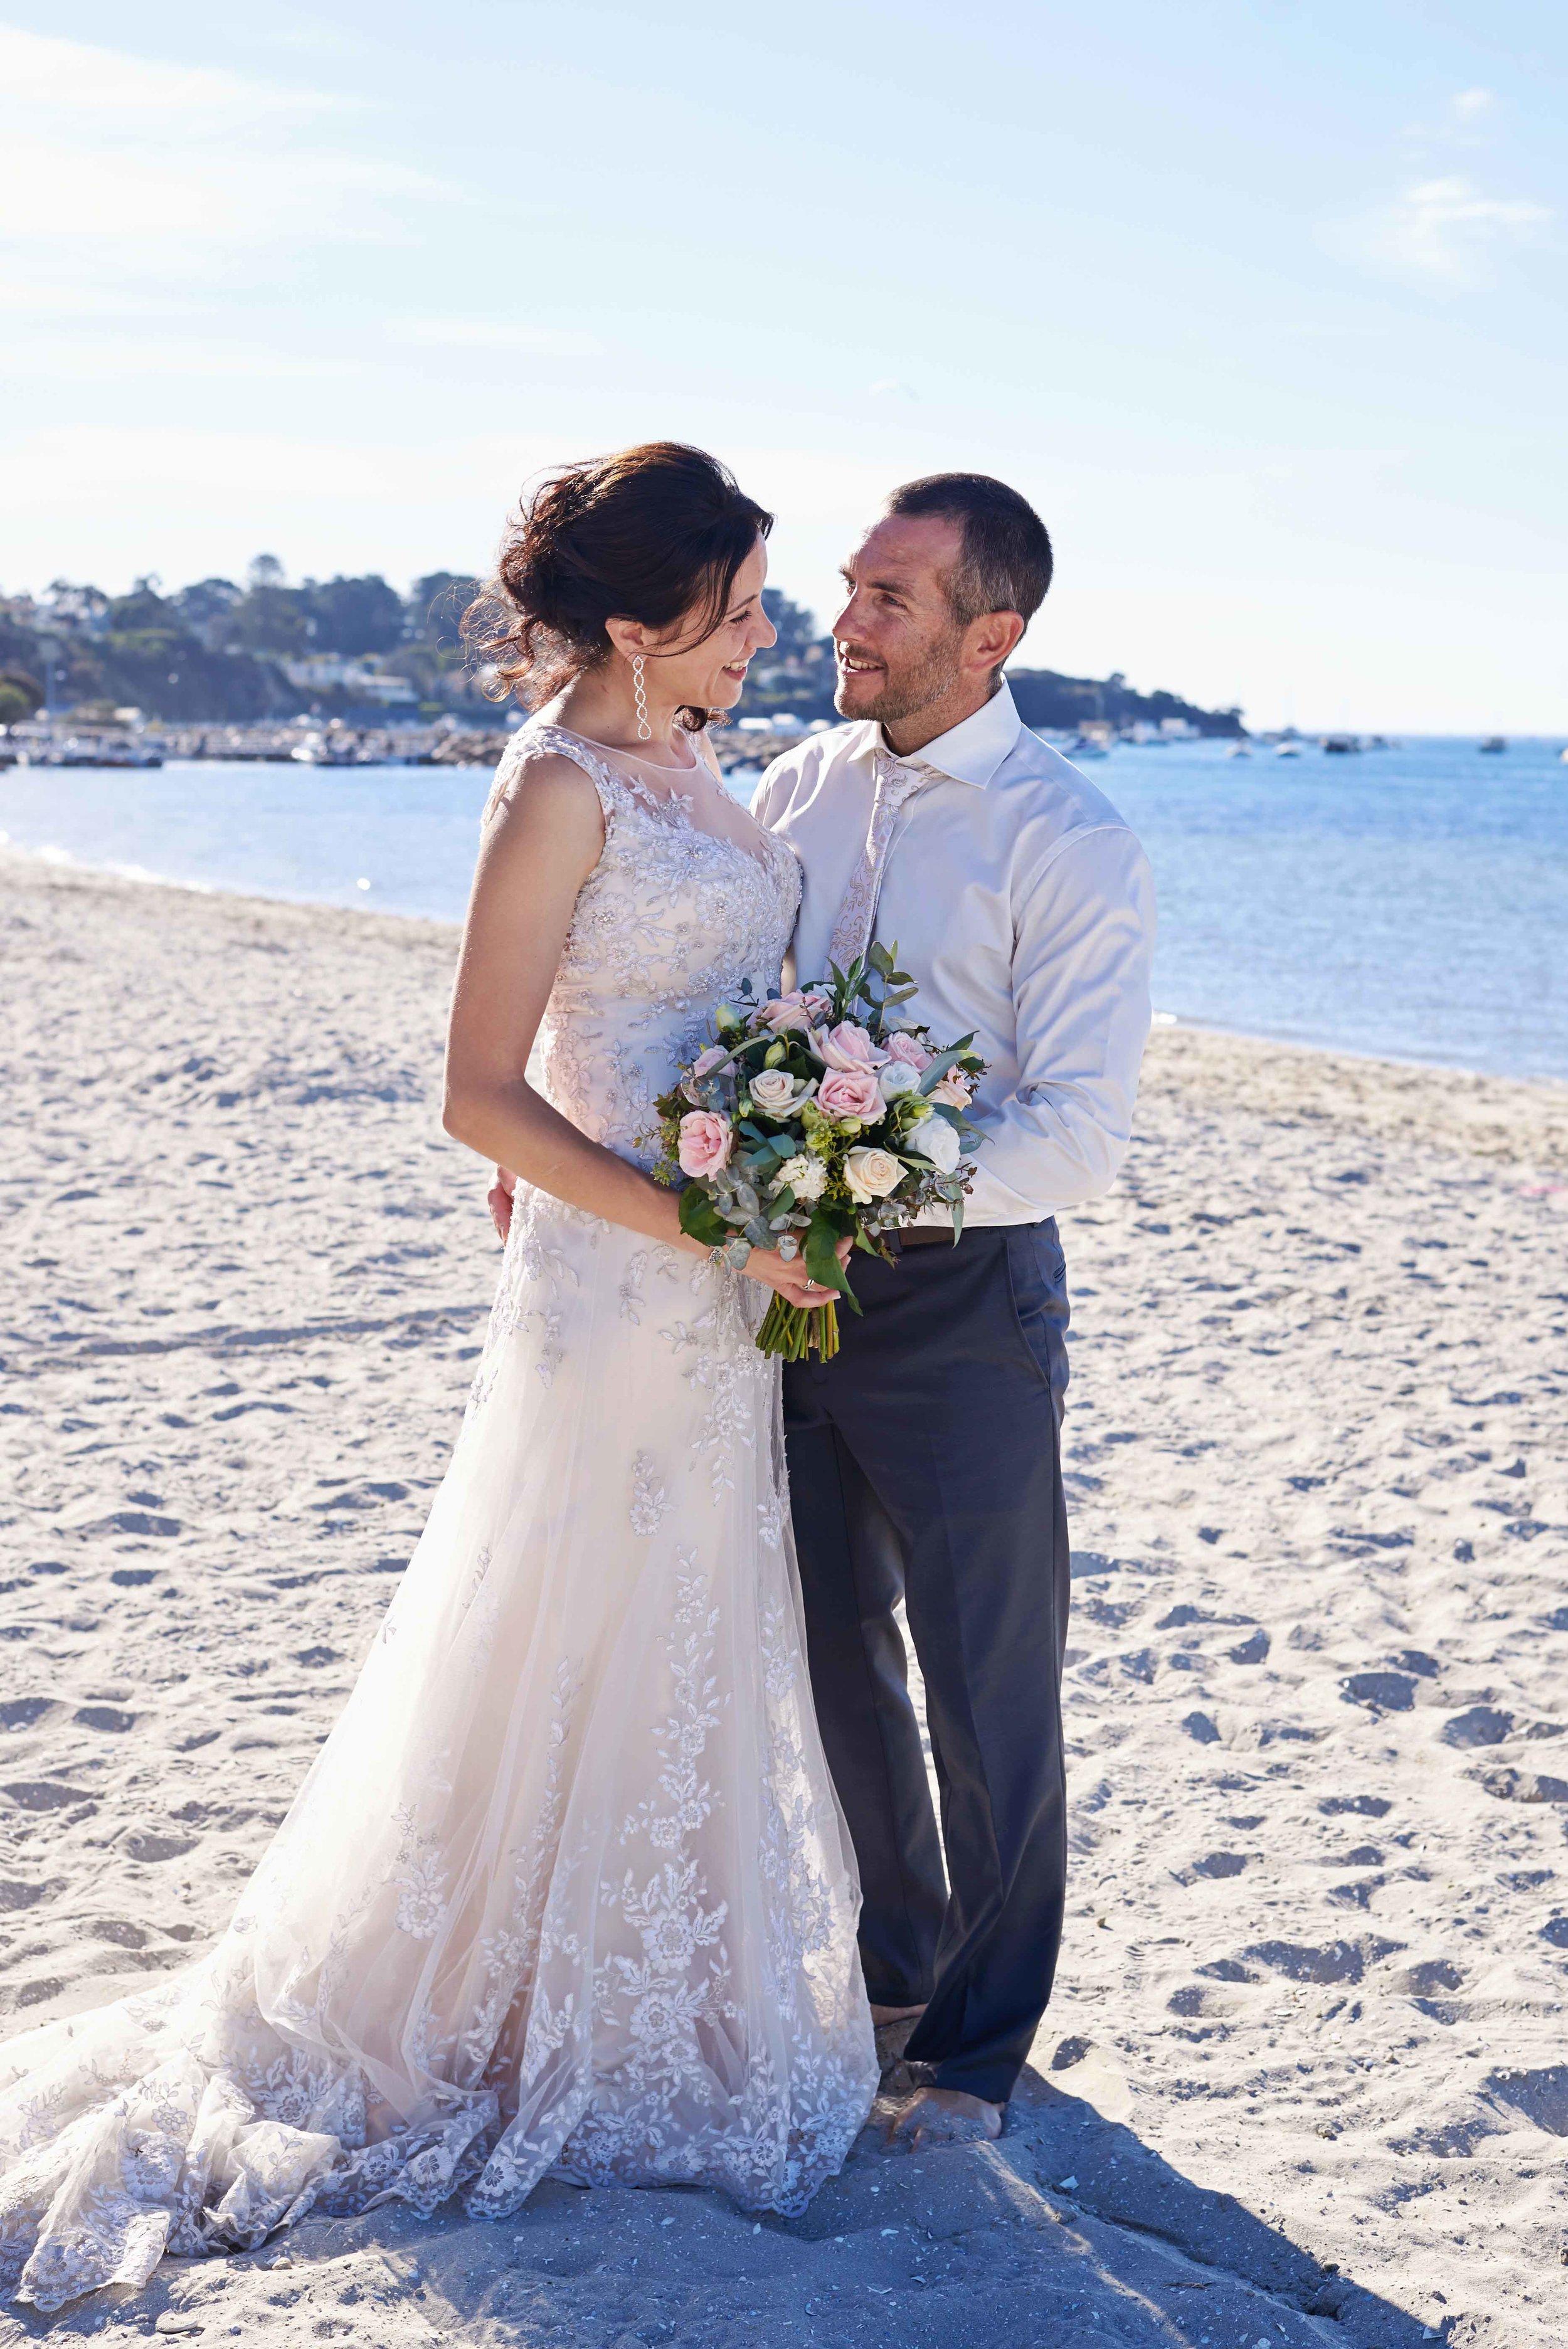 sorrento-wedding-photography-all-smiles-marissa-jade-photography-159.jpg